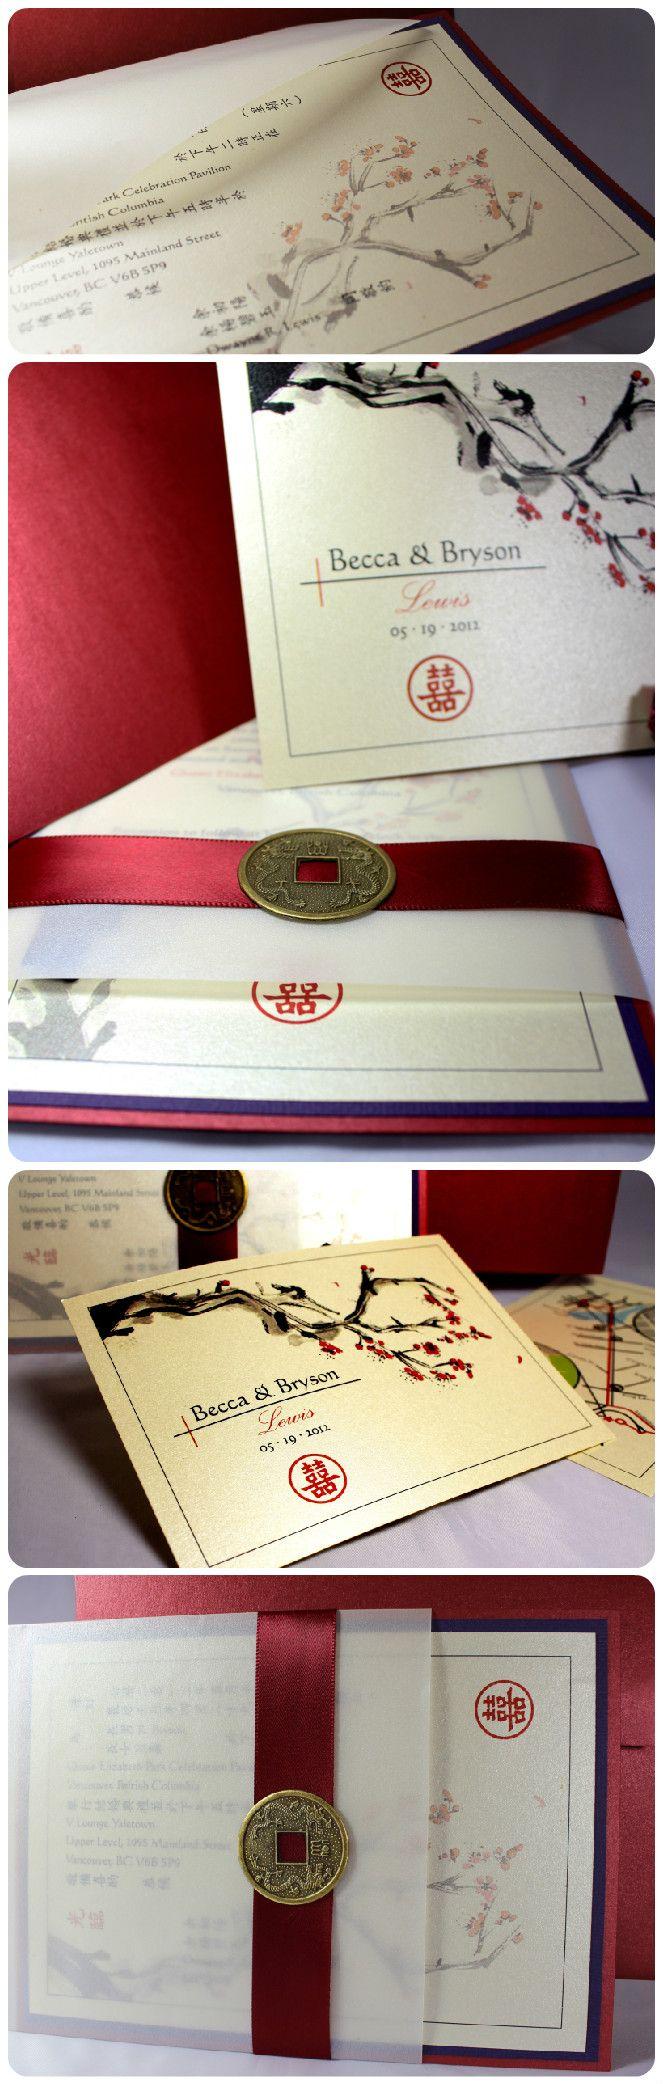 Best 25+ Japanese wedding themes ideas on Pinterest | Paper crane ...